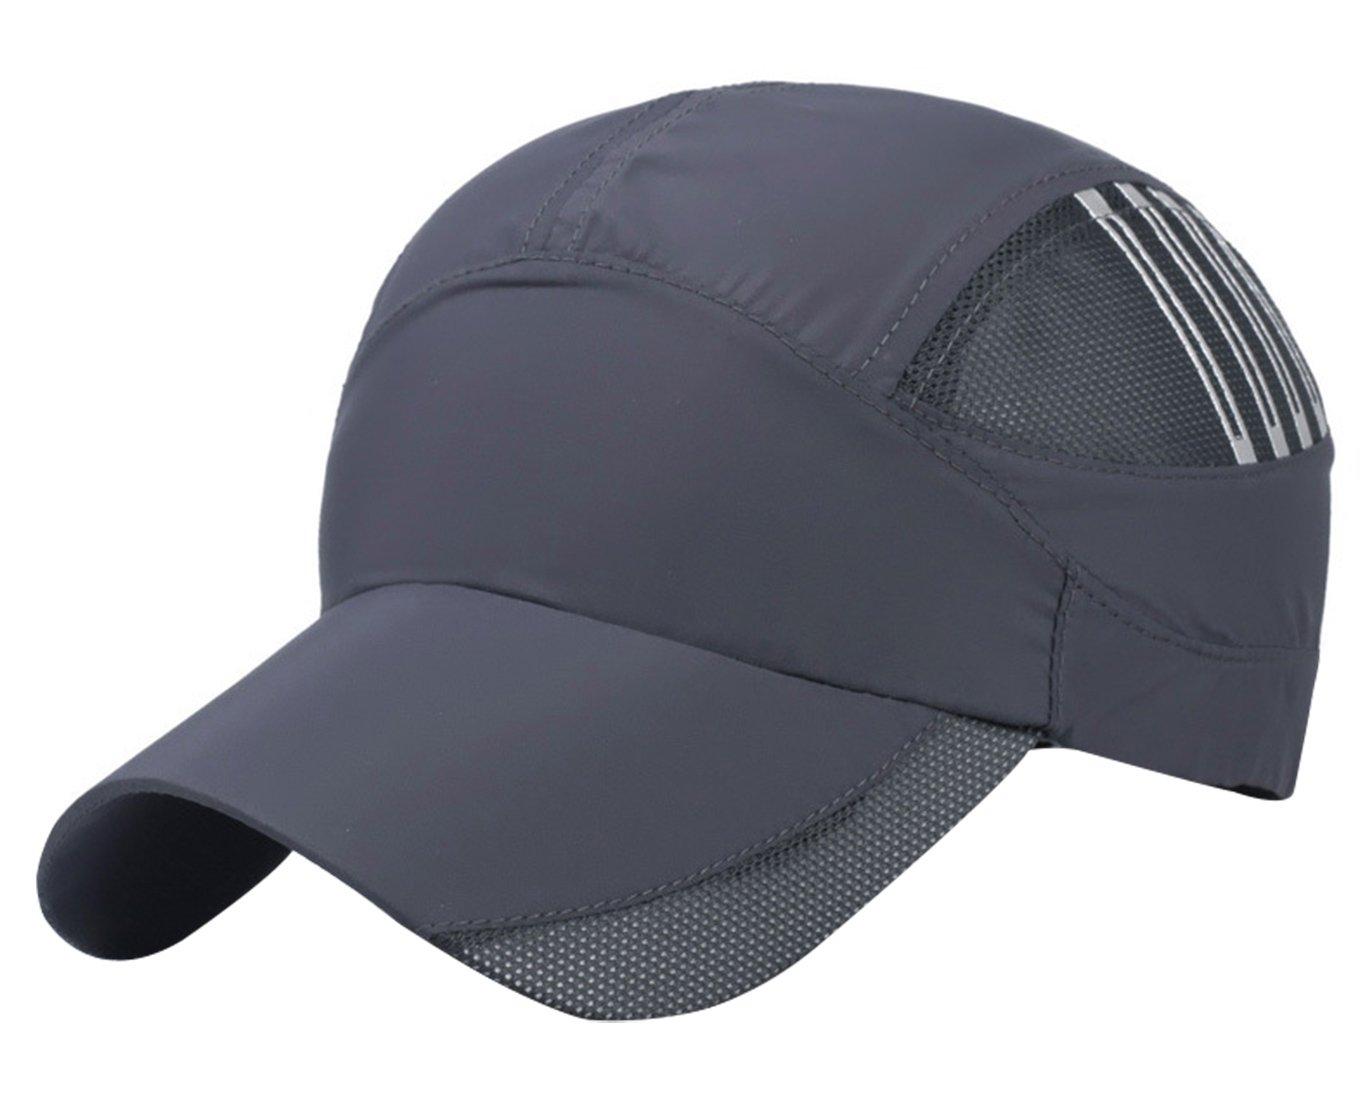 Amazon.com  Aivtalk Stripes Summer Baseball Cap Quick Dry Cooling Sun Hats  Flexfit Sports Caps Mesh Hat for Golf Cycling Running Fishing Outdoor  Research ... 3d571b281d9